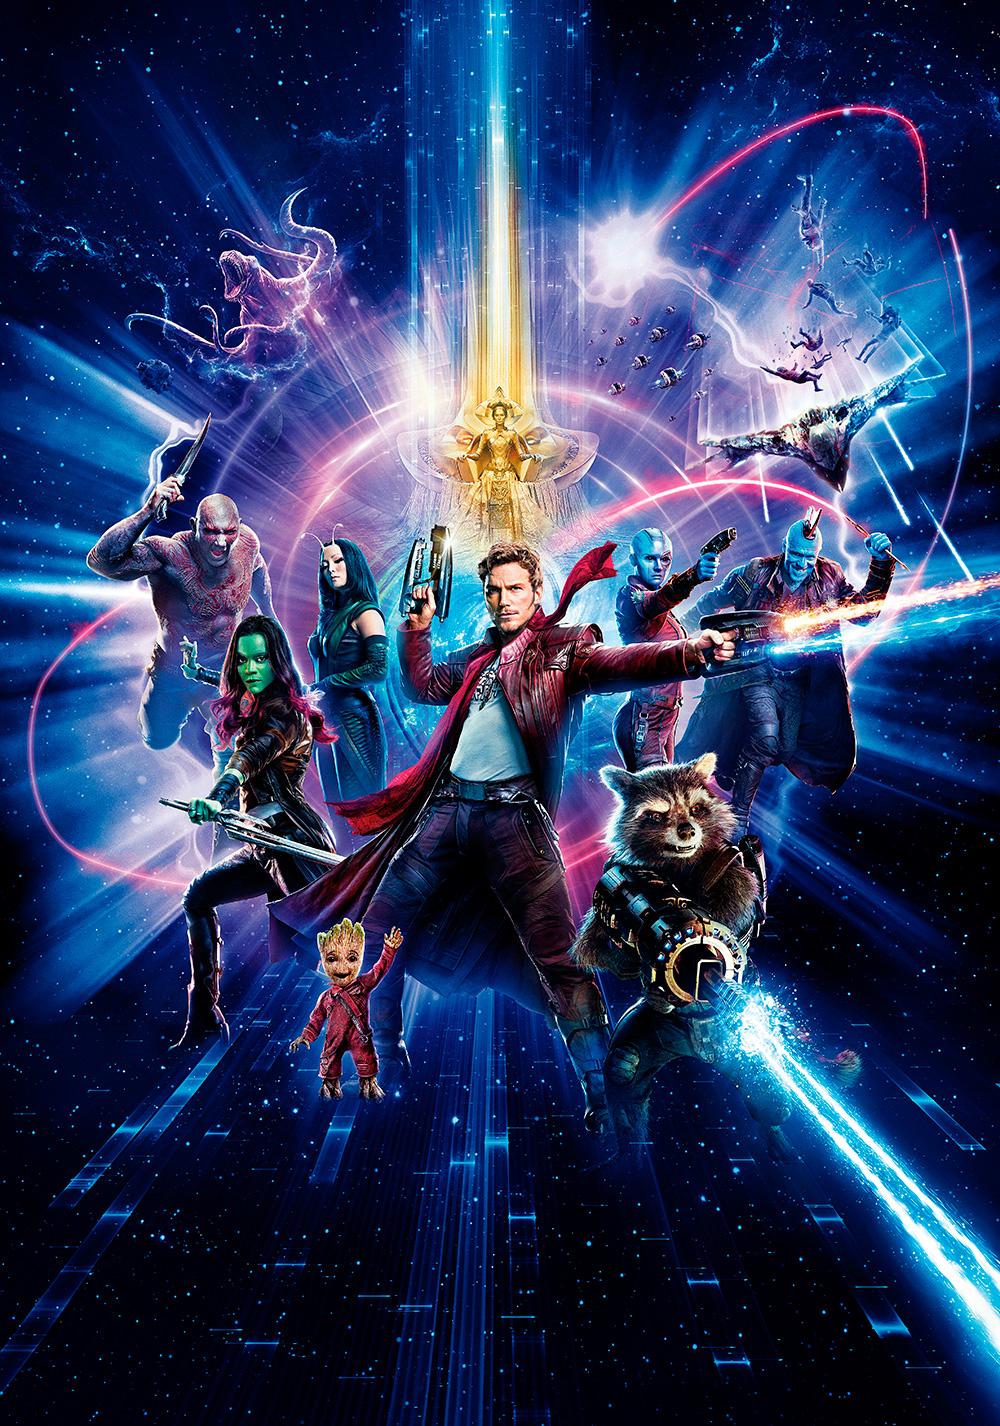 guardians of the galaxy vol 2 movie fanart fanarttv